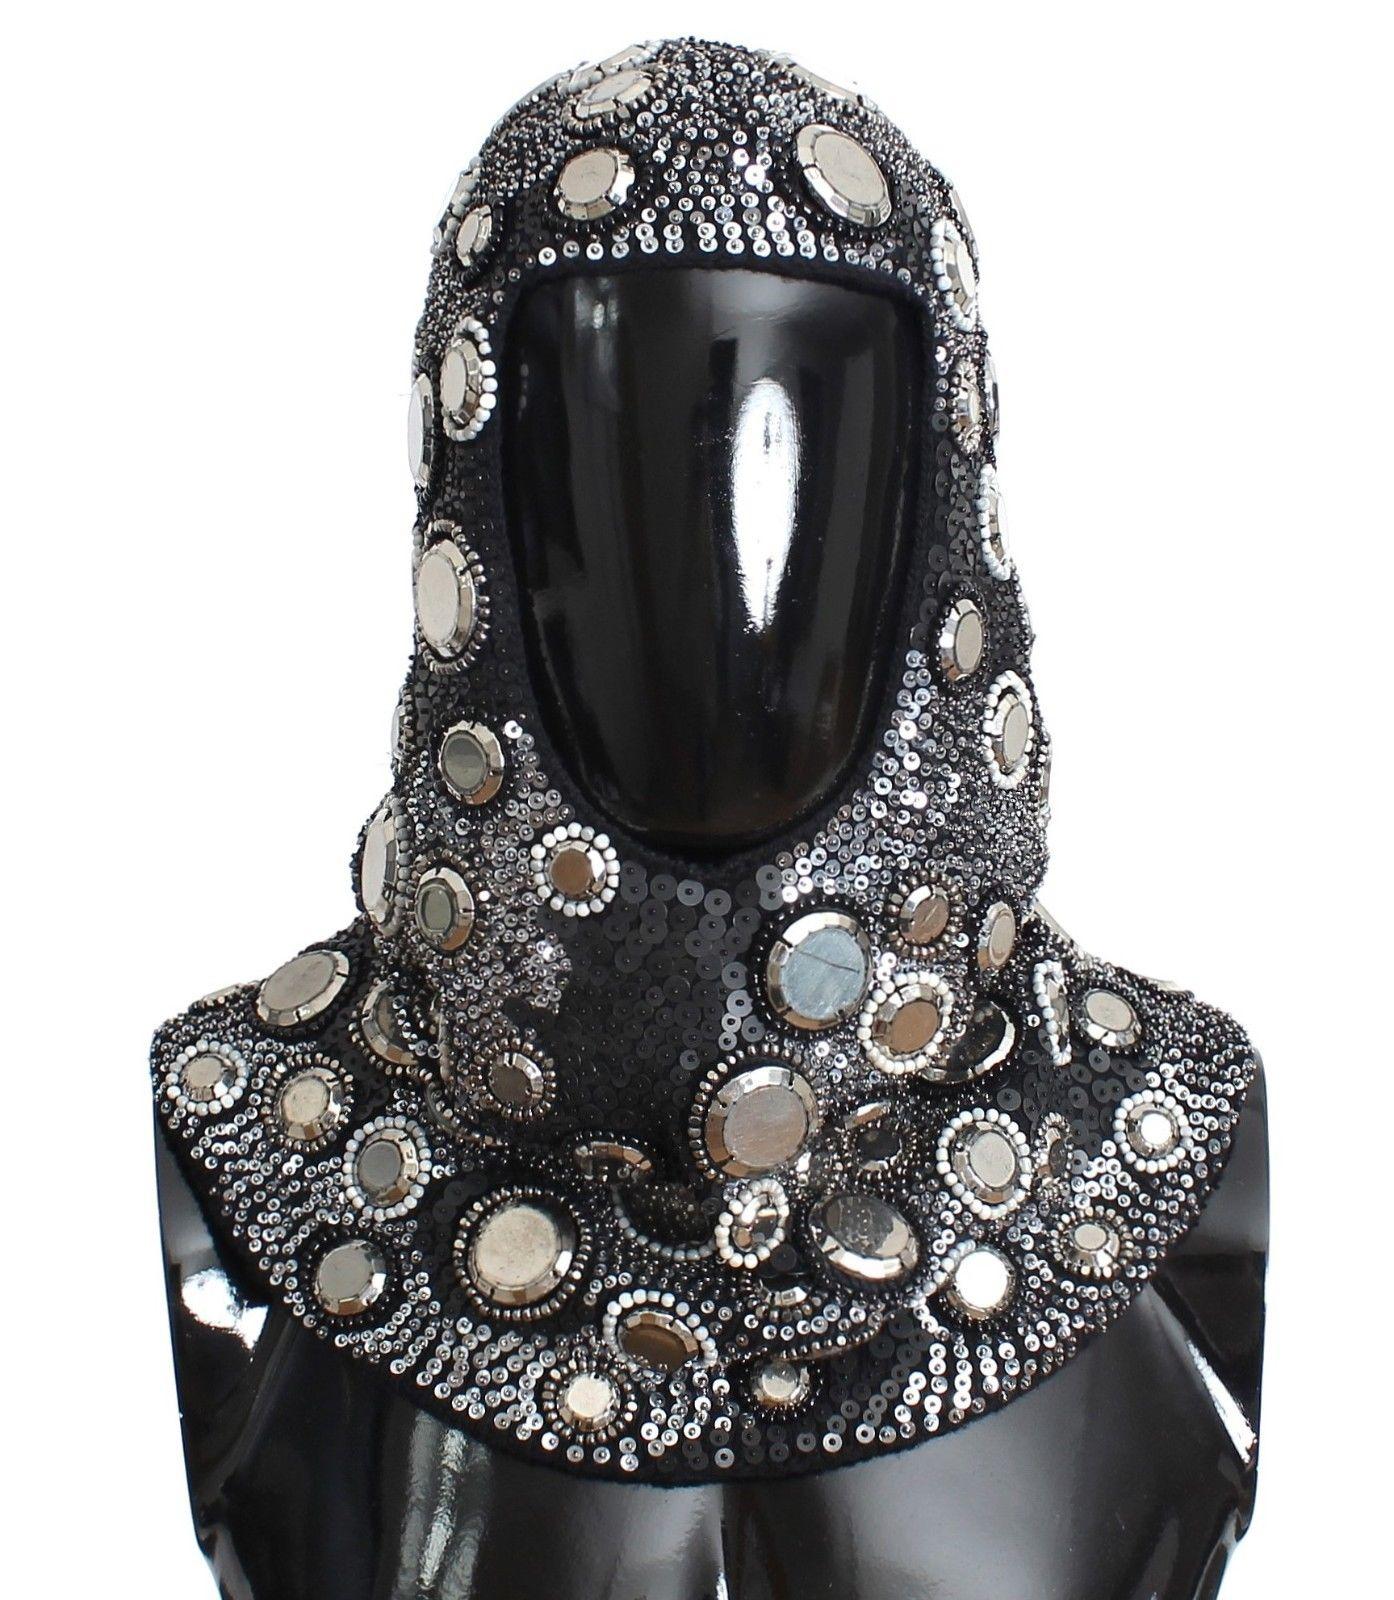 Dolce & Gabbana Men's Wool Crystal Runway Catwalk Crochet Hood Scarf Black SIG11151